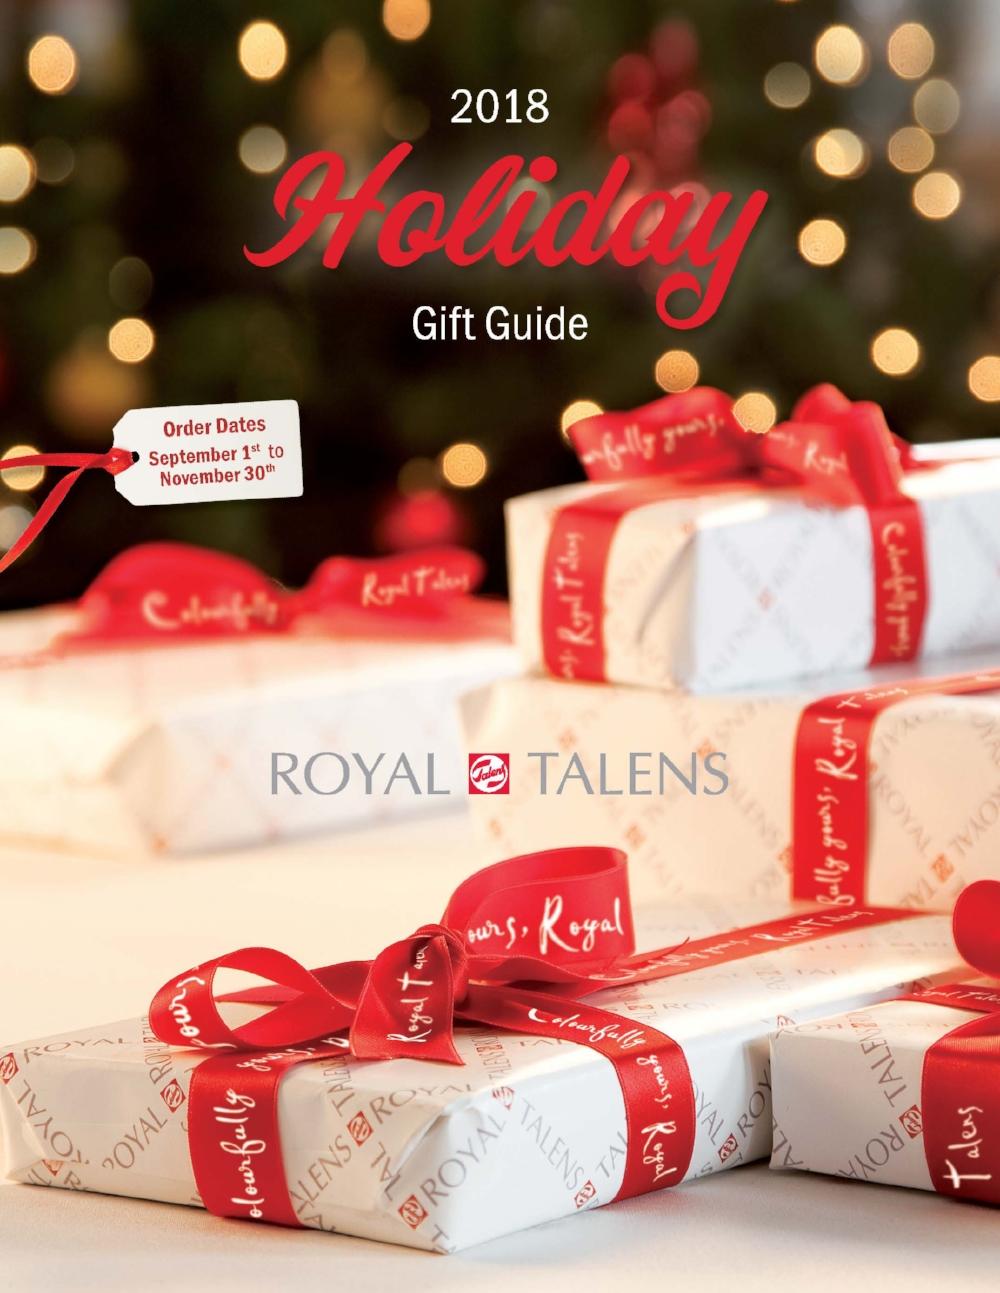 RTNA_Holiday_Gift_Guide_2018_Cover.jpg